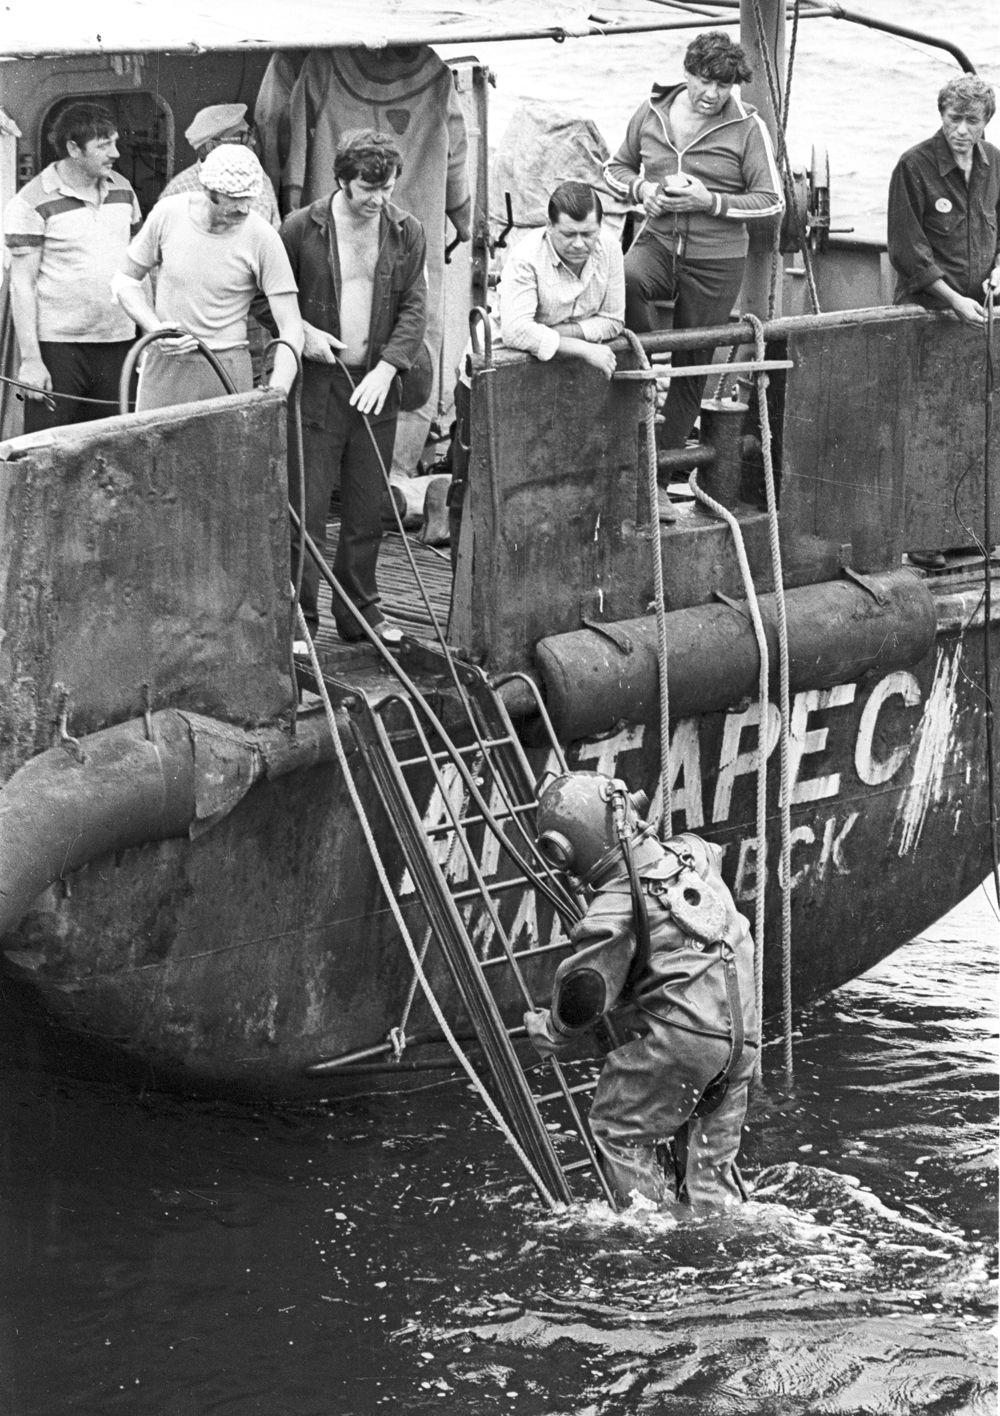 Фото затонувшего адмирала нахимова приключениях